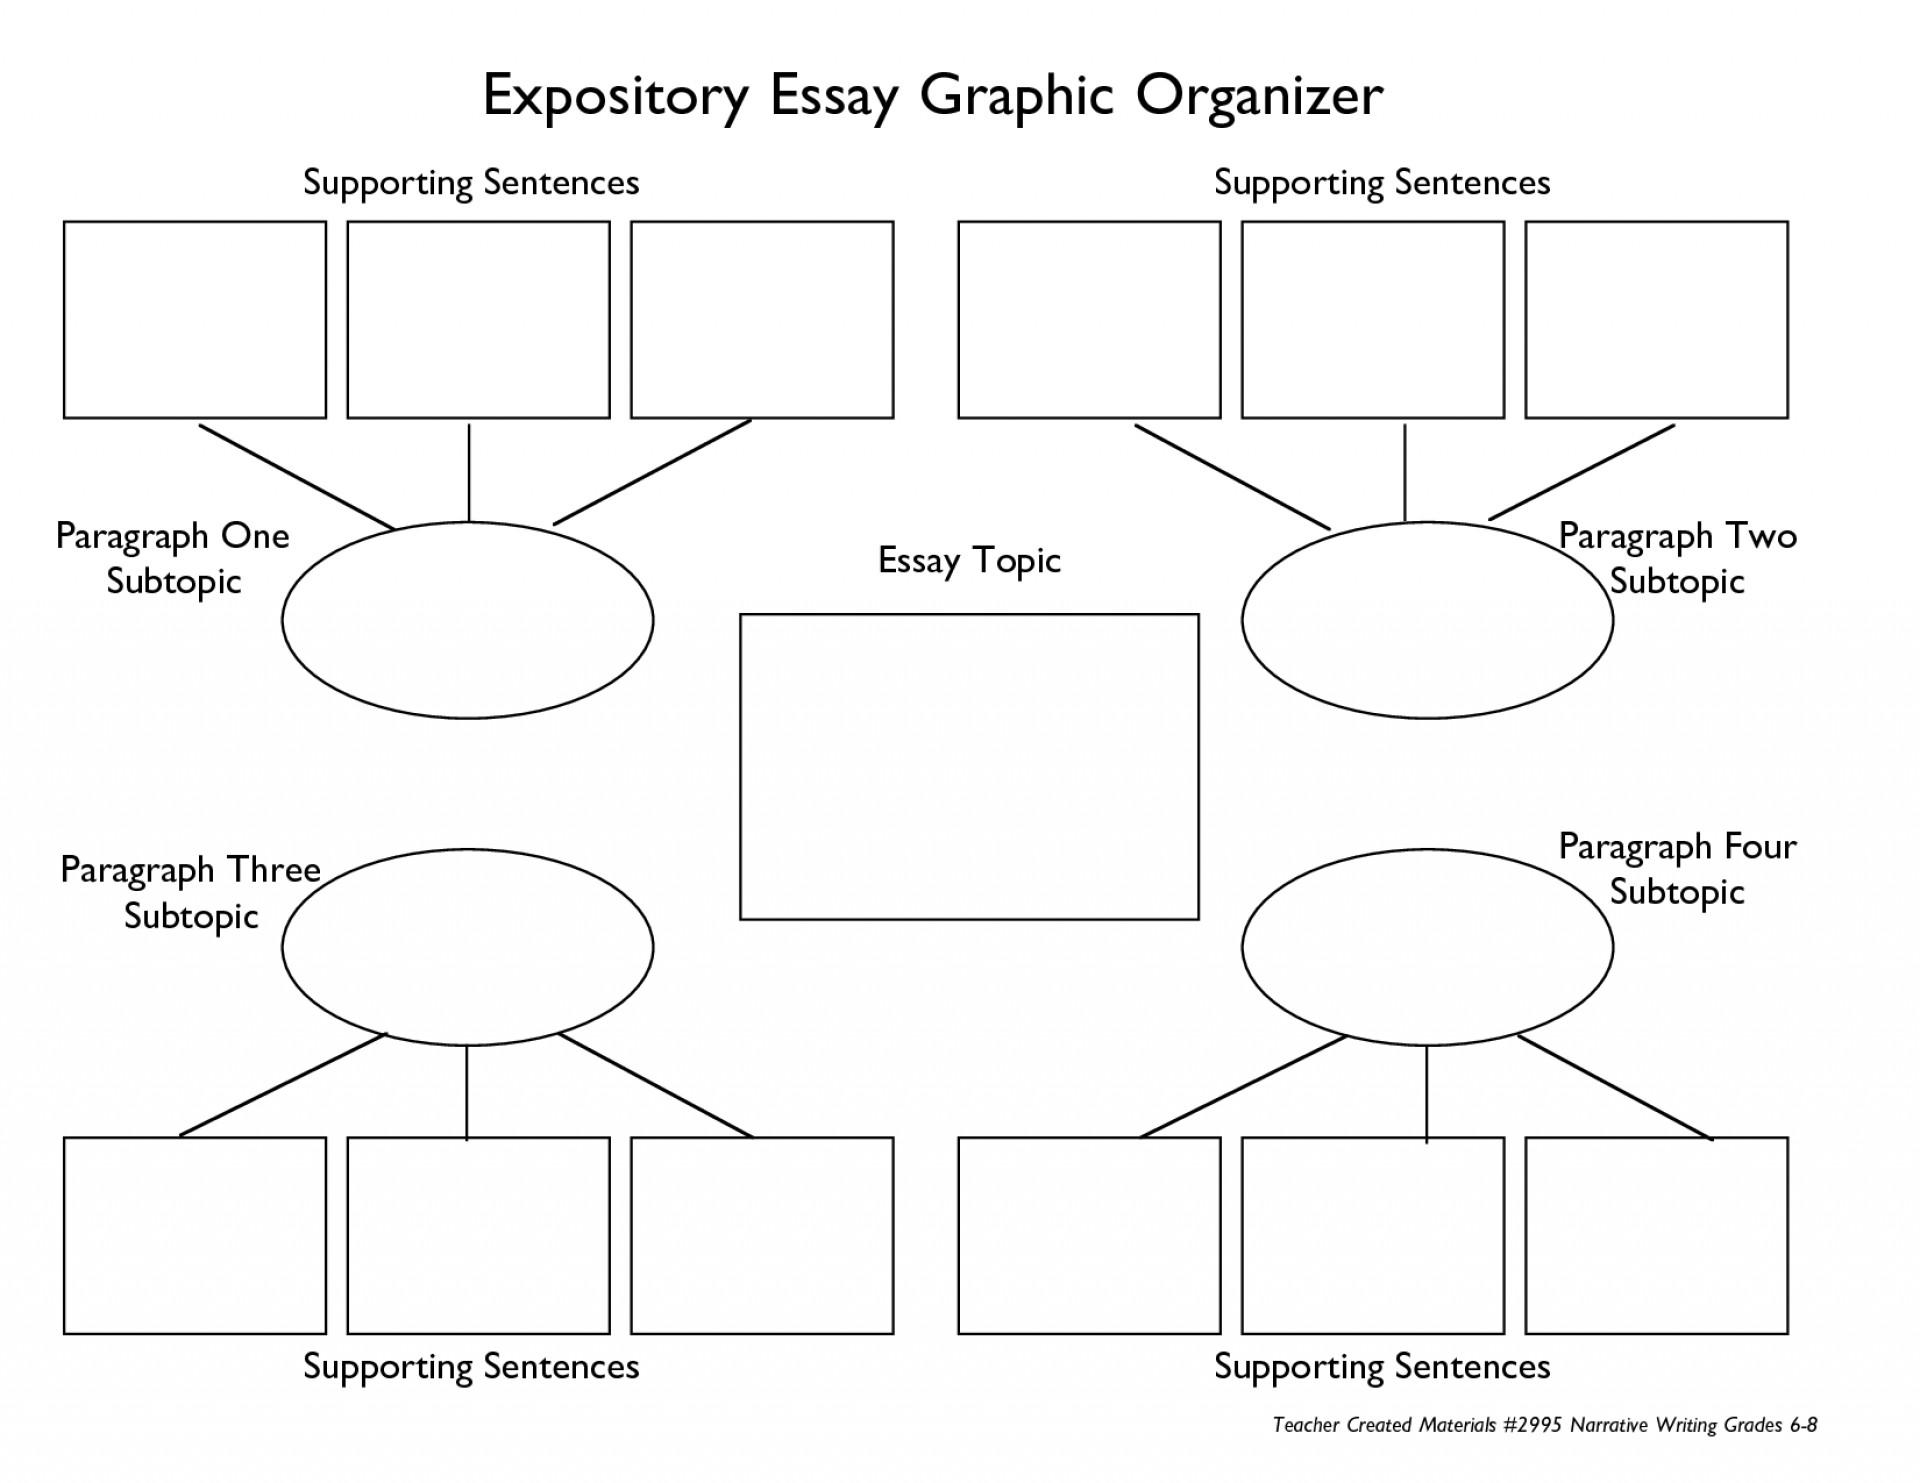 022 College Essay Organizer Surprising Application Graphic Organizers Argumentative 1920